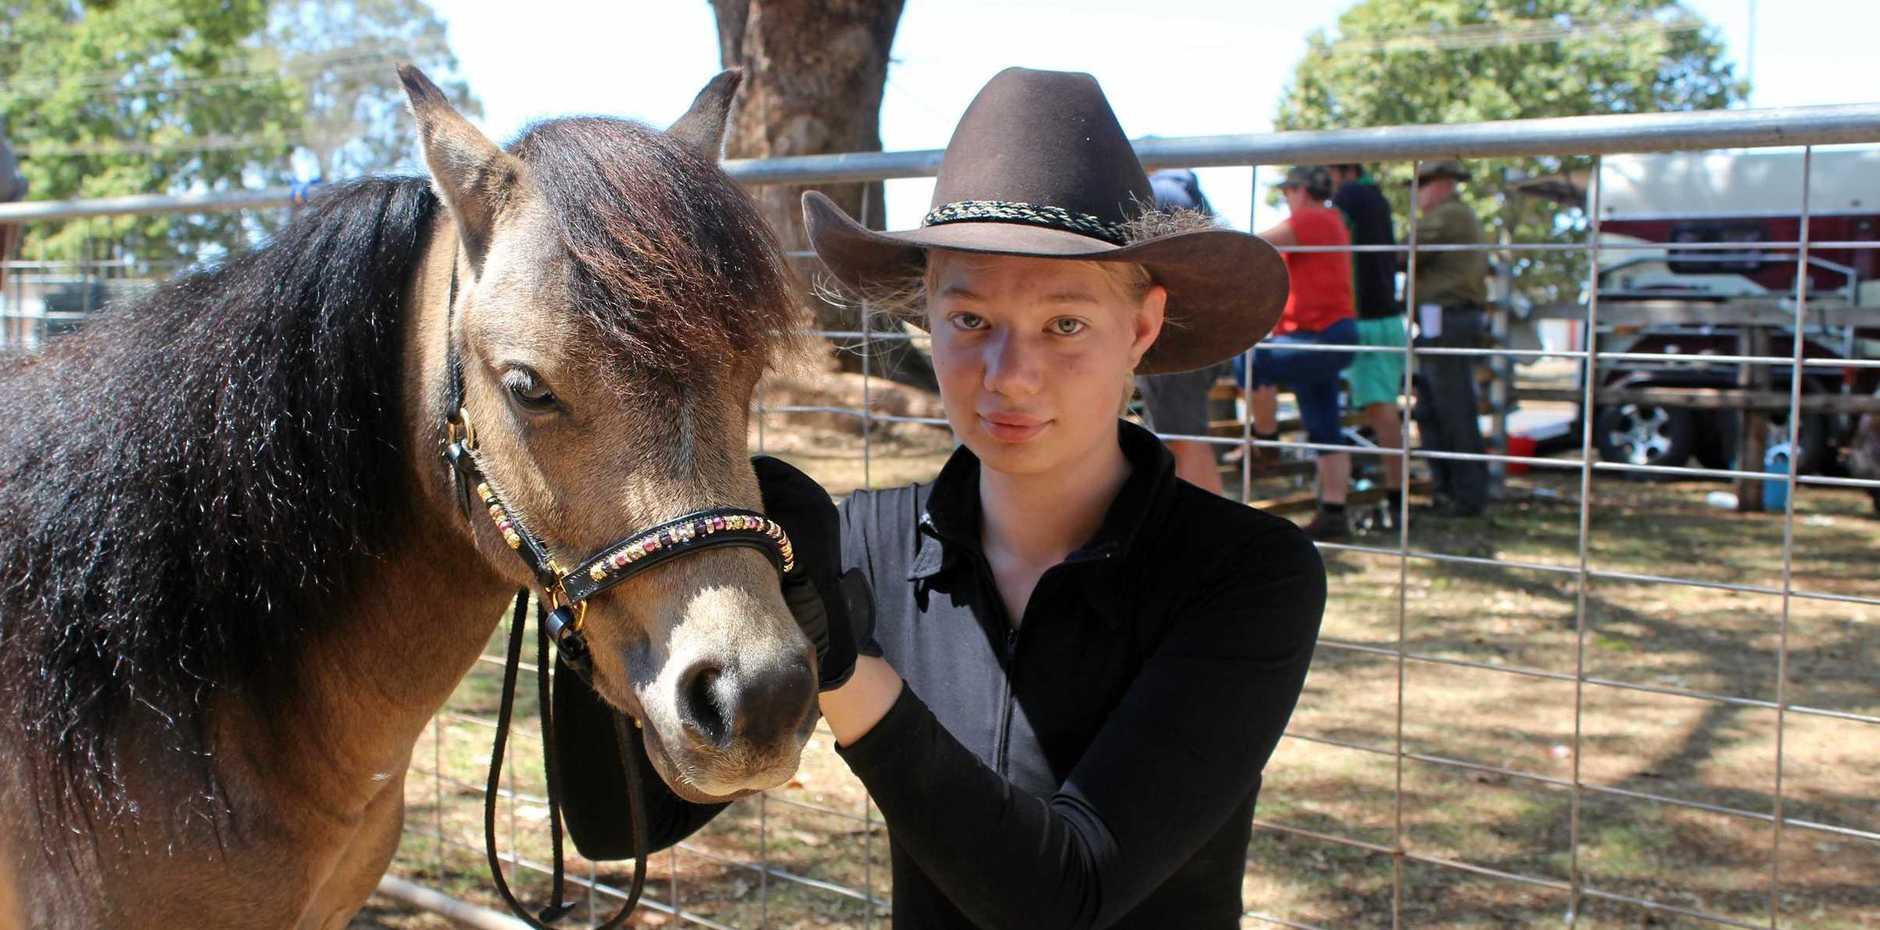 Wondai'd Madison Wecker with her pony Jen Rowan Sovereign.